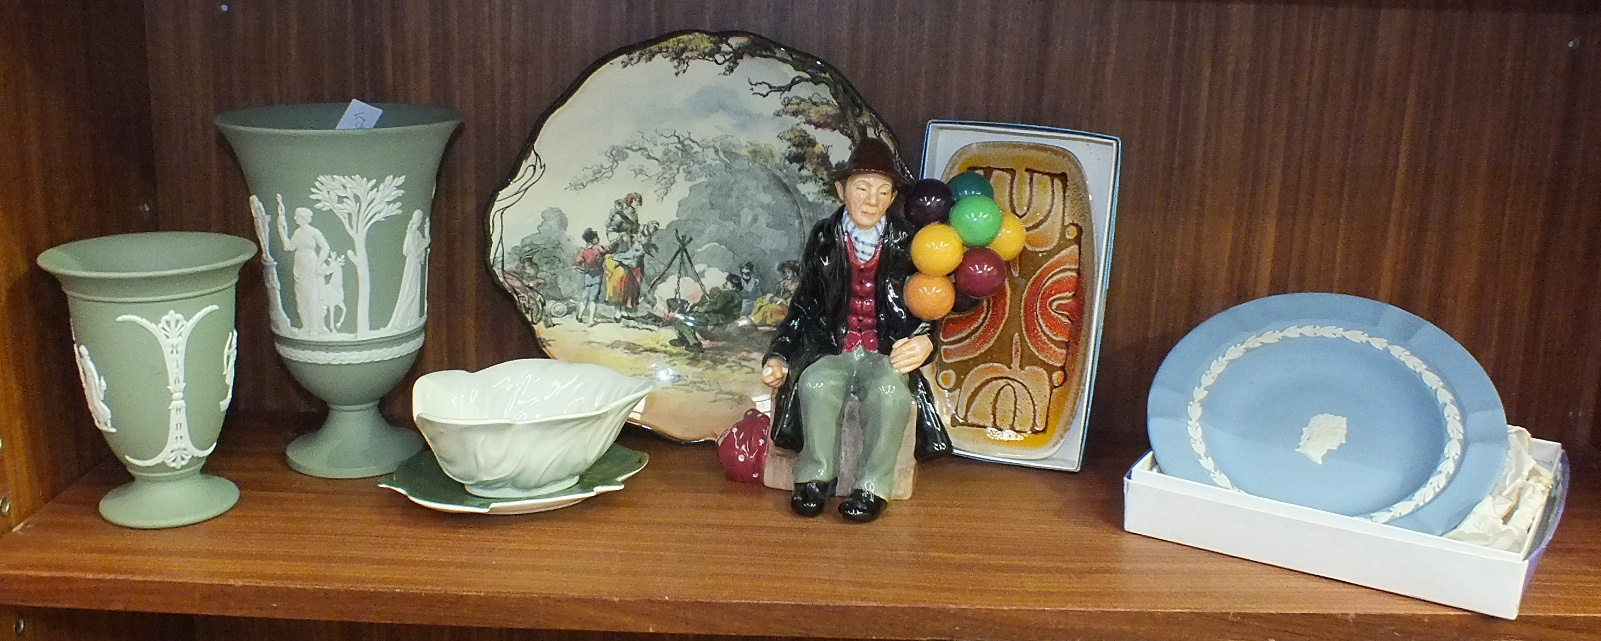 Lot 110 - A Royal Doulton figurine 'The Balloon Man' HN1934, 20cm, two Royal Doulton 'English Old Scenes'